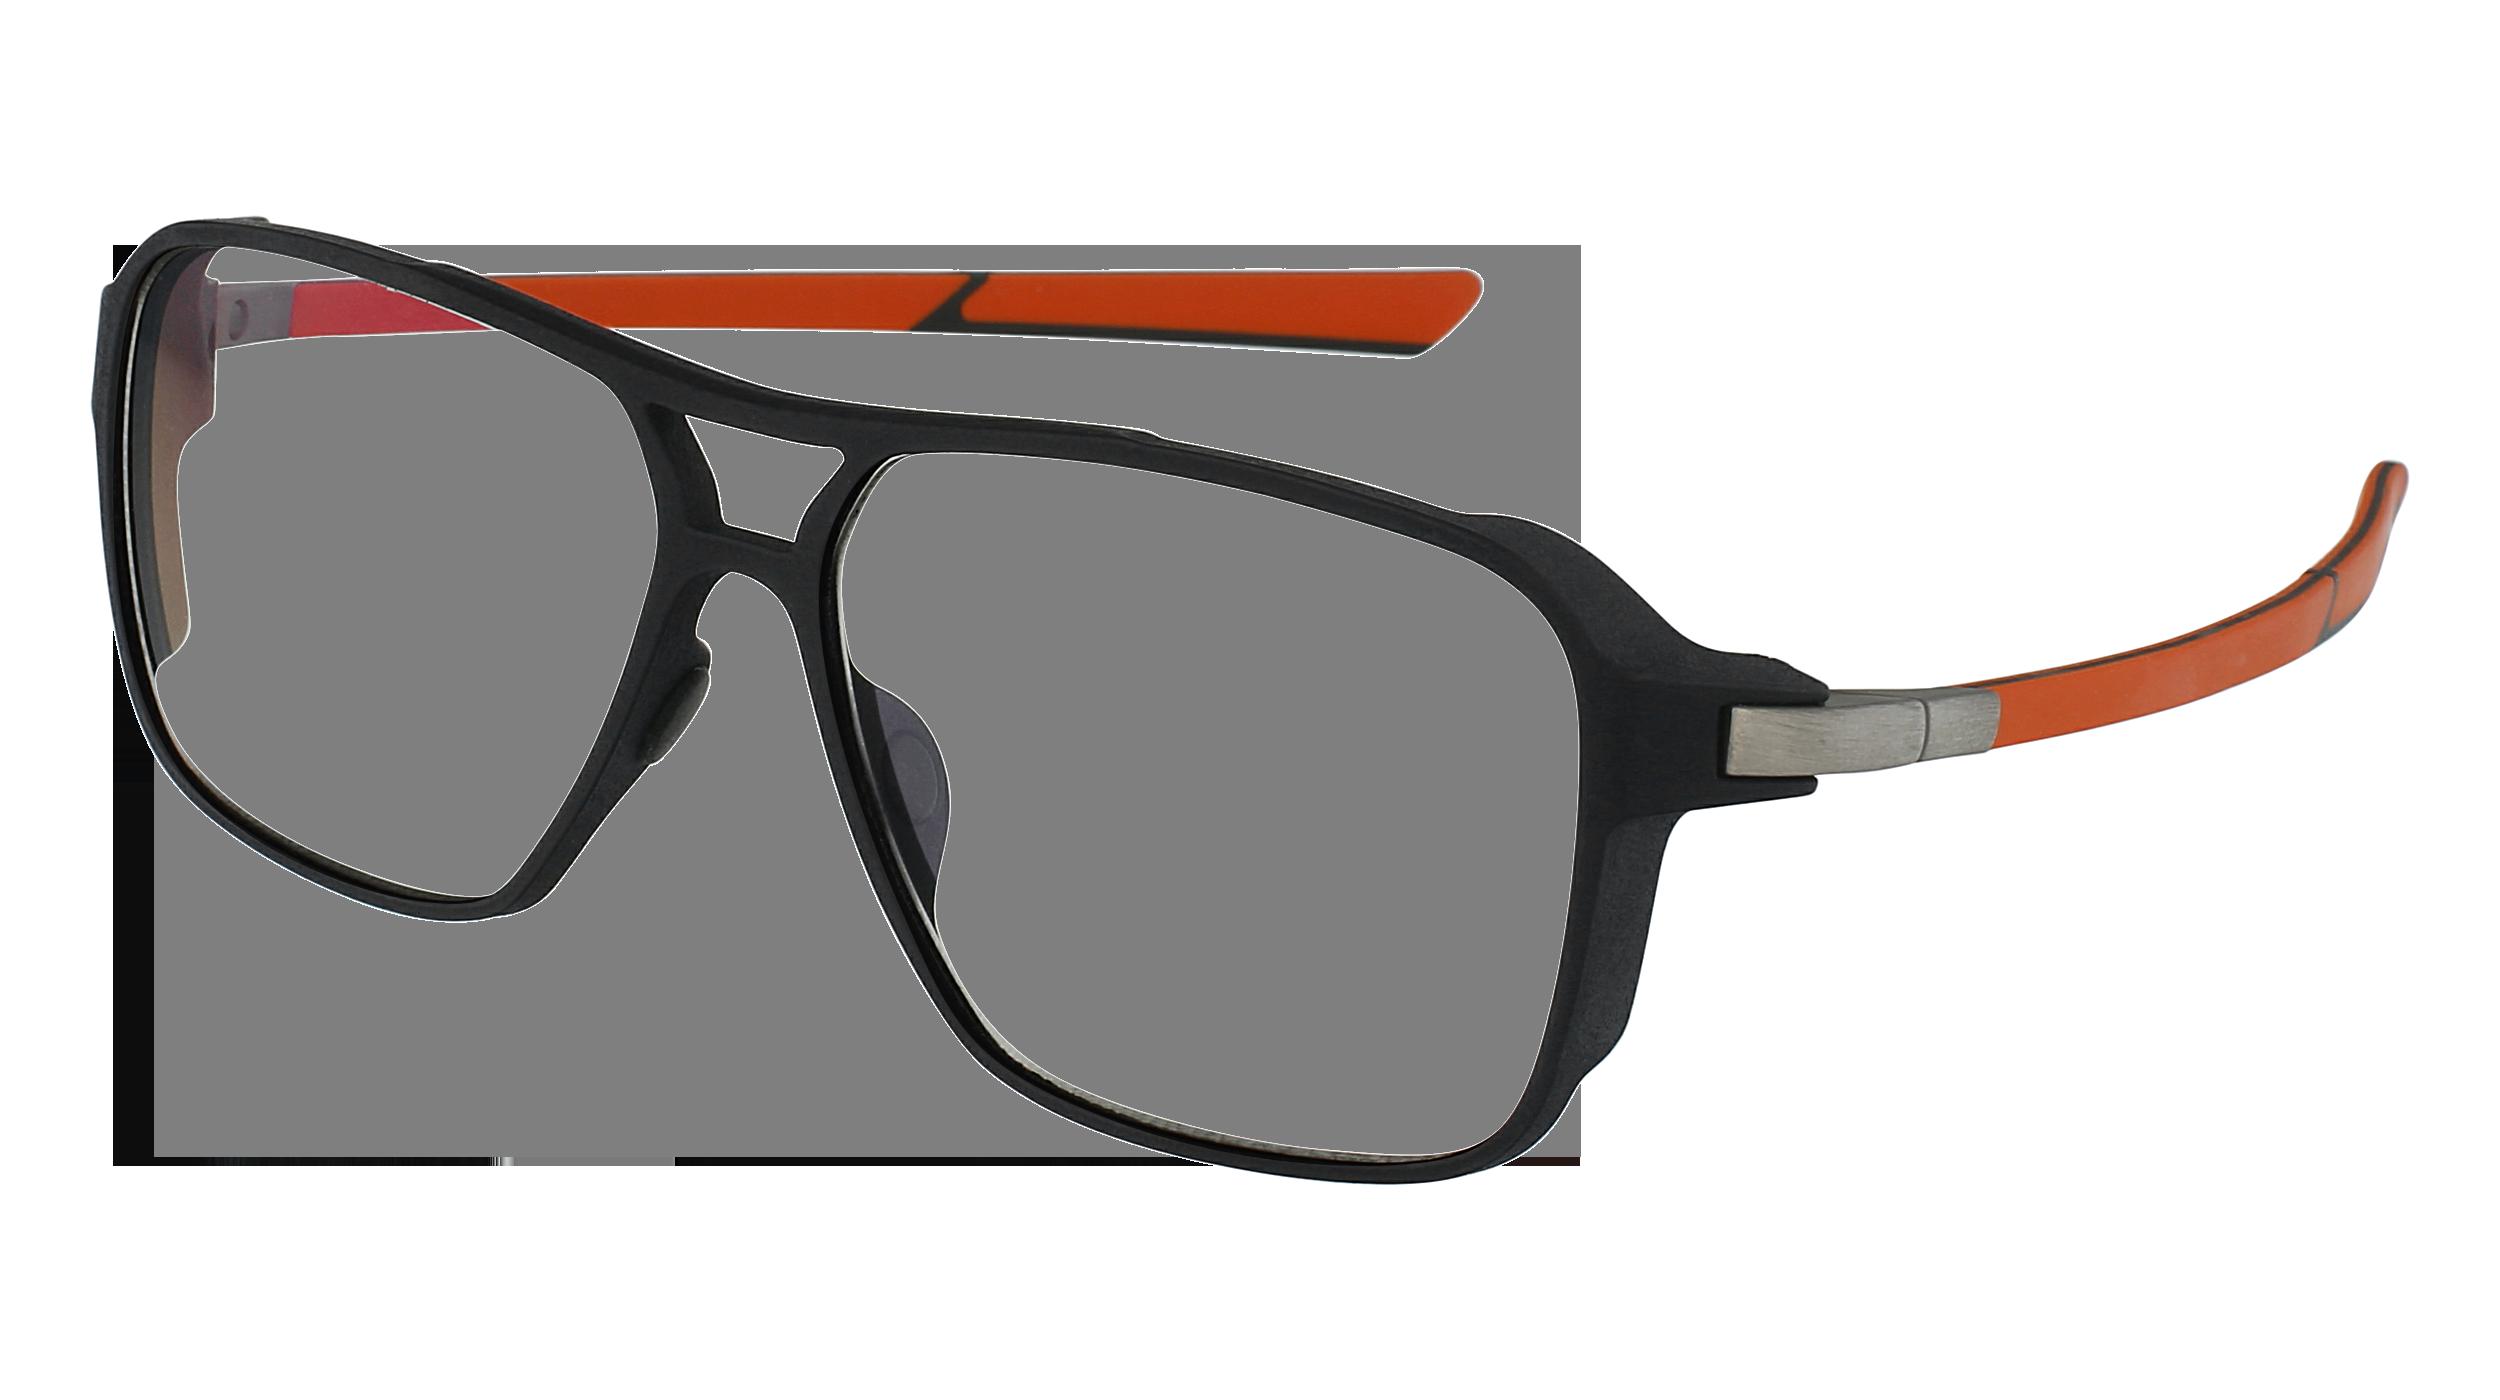 McLaren MLSGPO04.C02.57